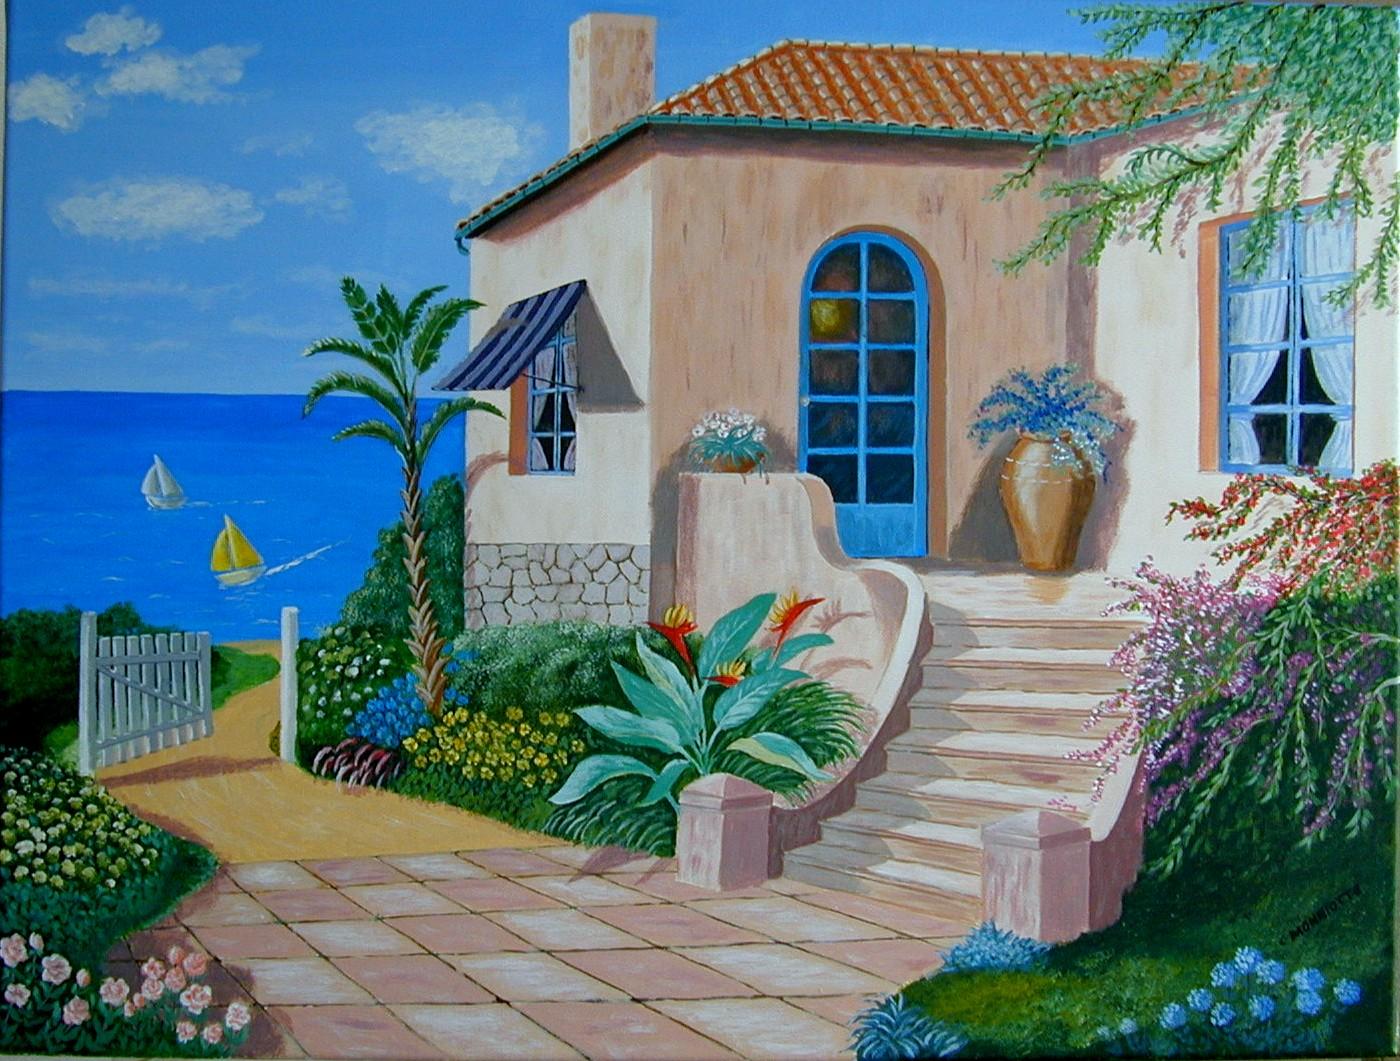 villa de bord de mer les peintures acryliques de christian monniotte. Black Bedroom Furniture Sets. Home Design Ideas